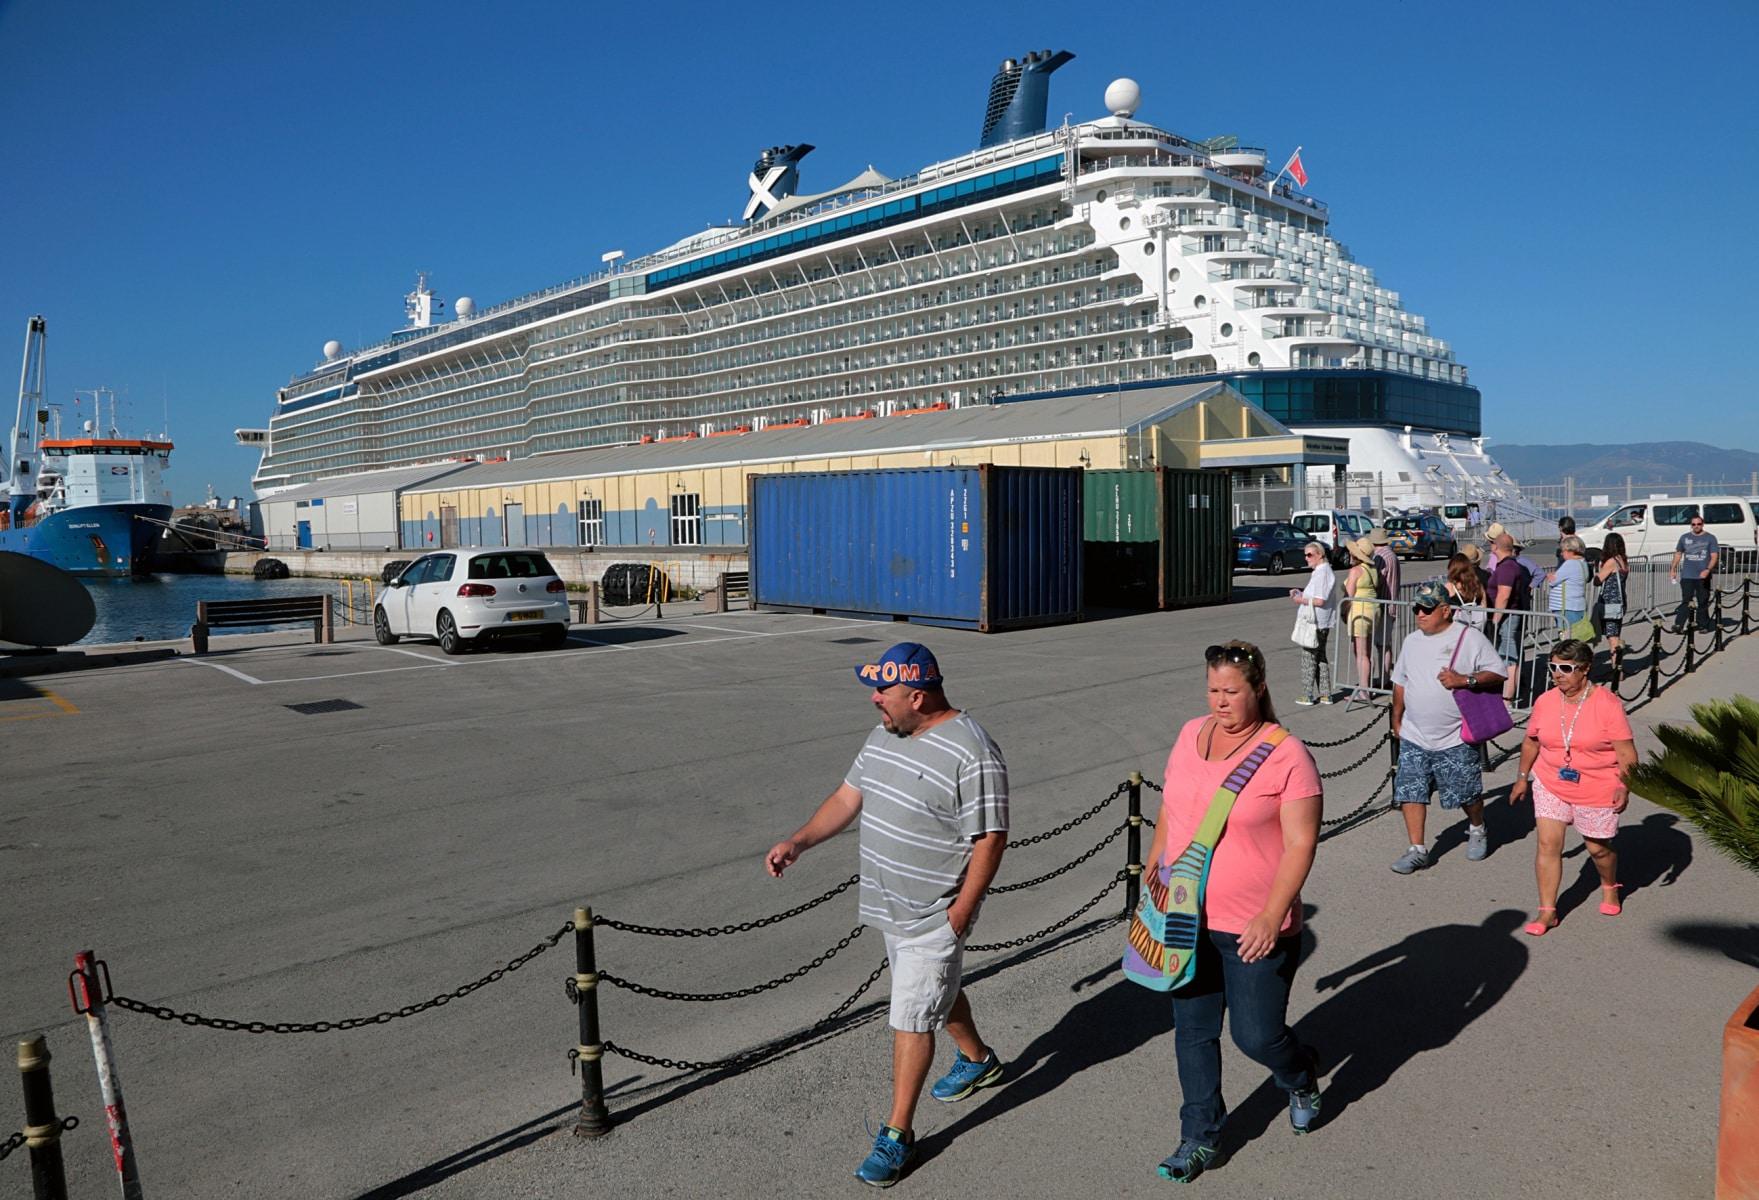 08-may-2017-27visita-inaugural-del-crucero-celebrity-or-reflection-a-gibraltar_33895390134_o